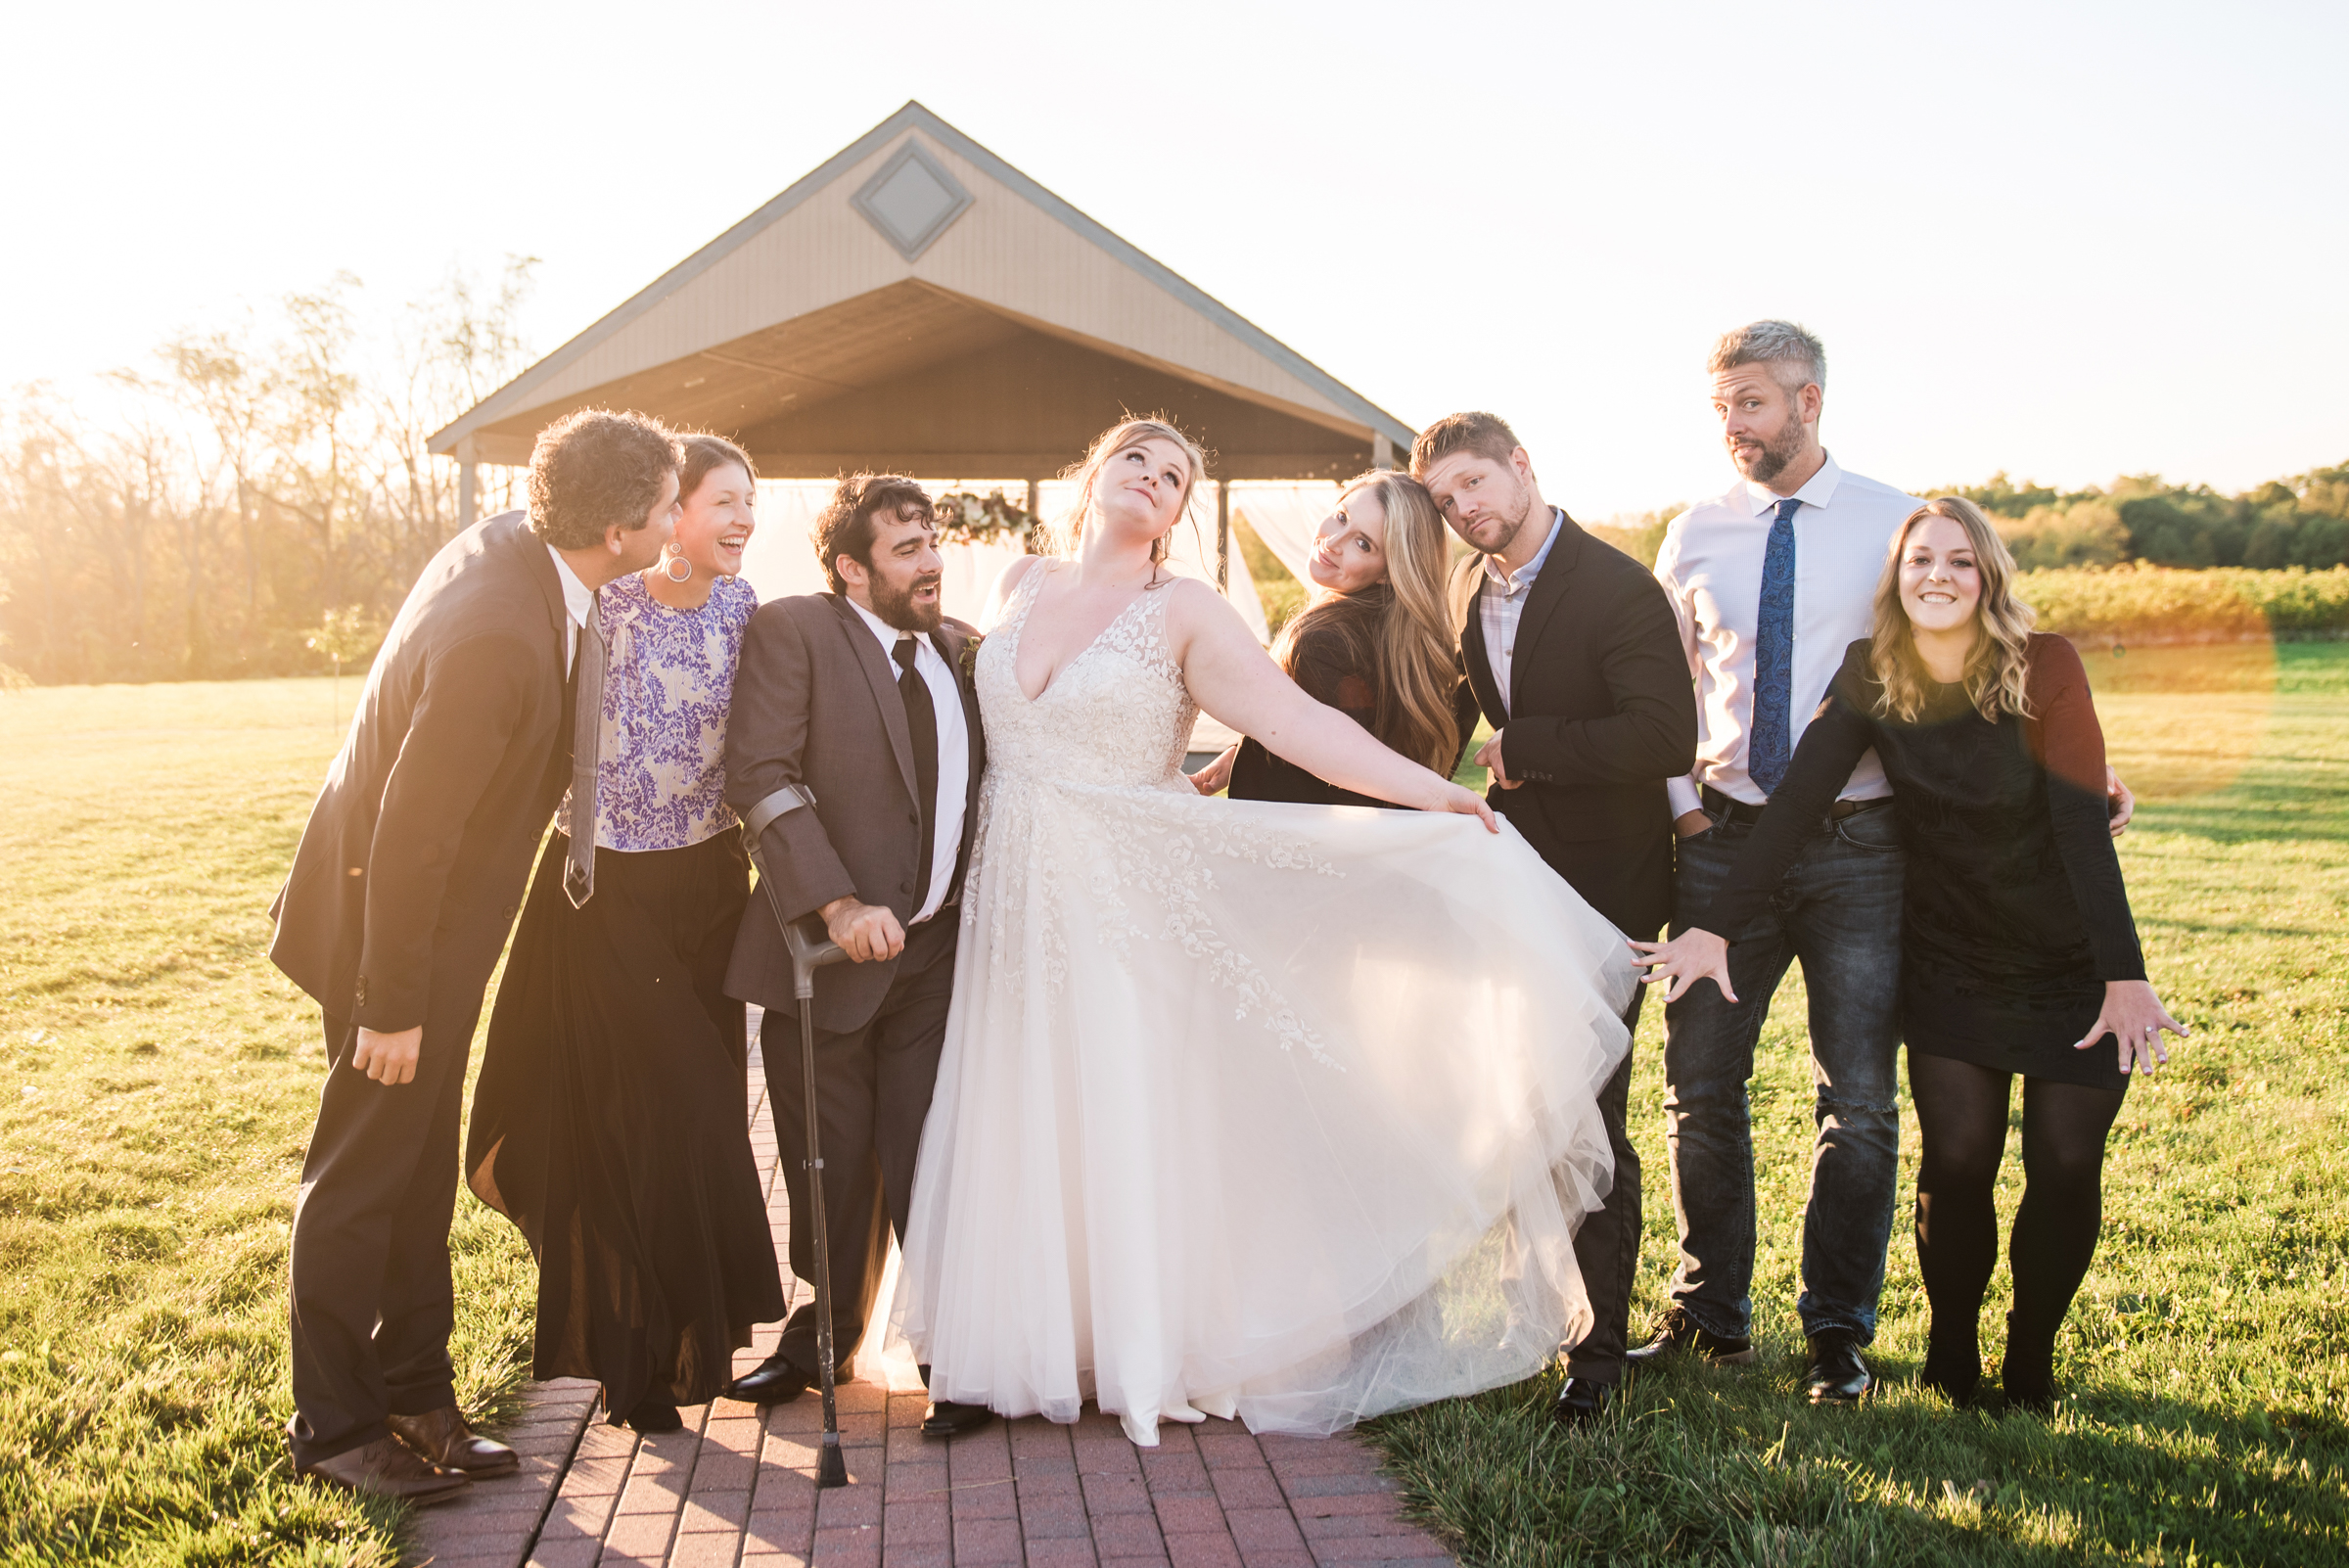 Zugibe_Vineyards_Finger_Lakes_Wedding_JILL_STUDIO_Rochester_NY_Photographer_DSC_4116.jpg